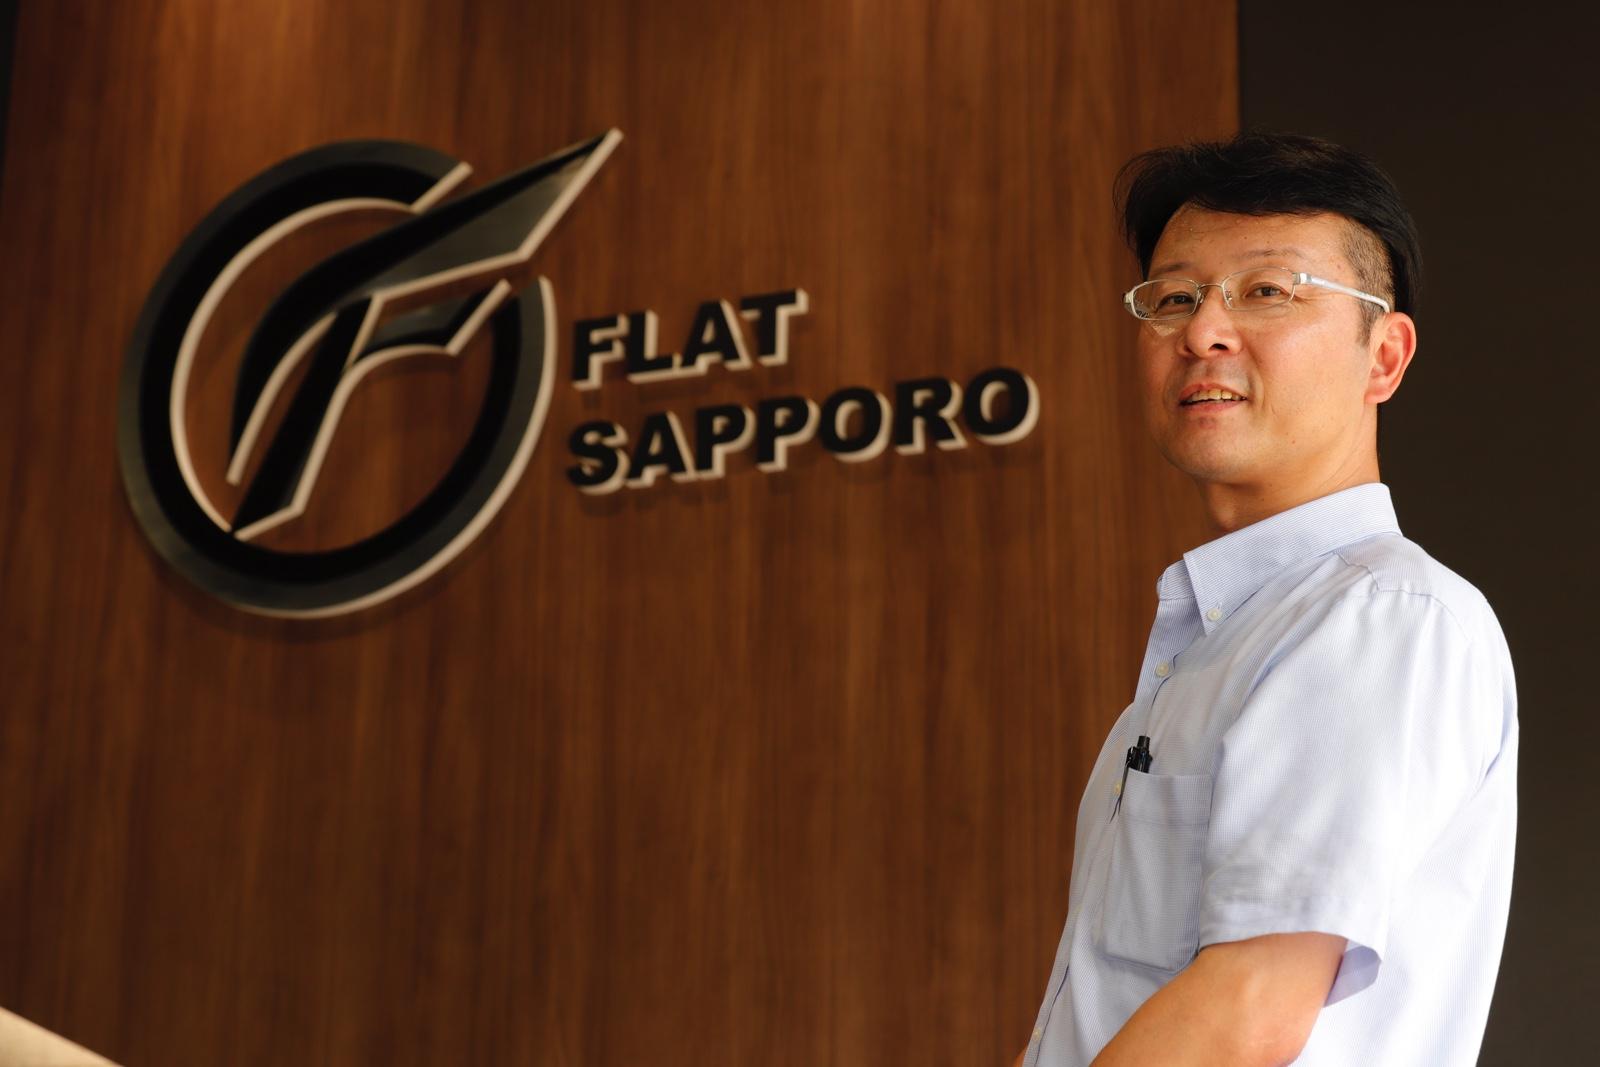 FLAT SAPPORO店長 遠藤